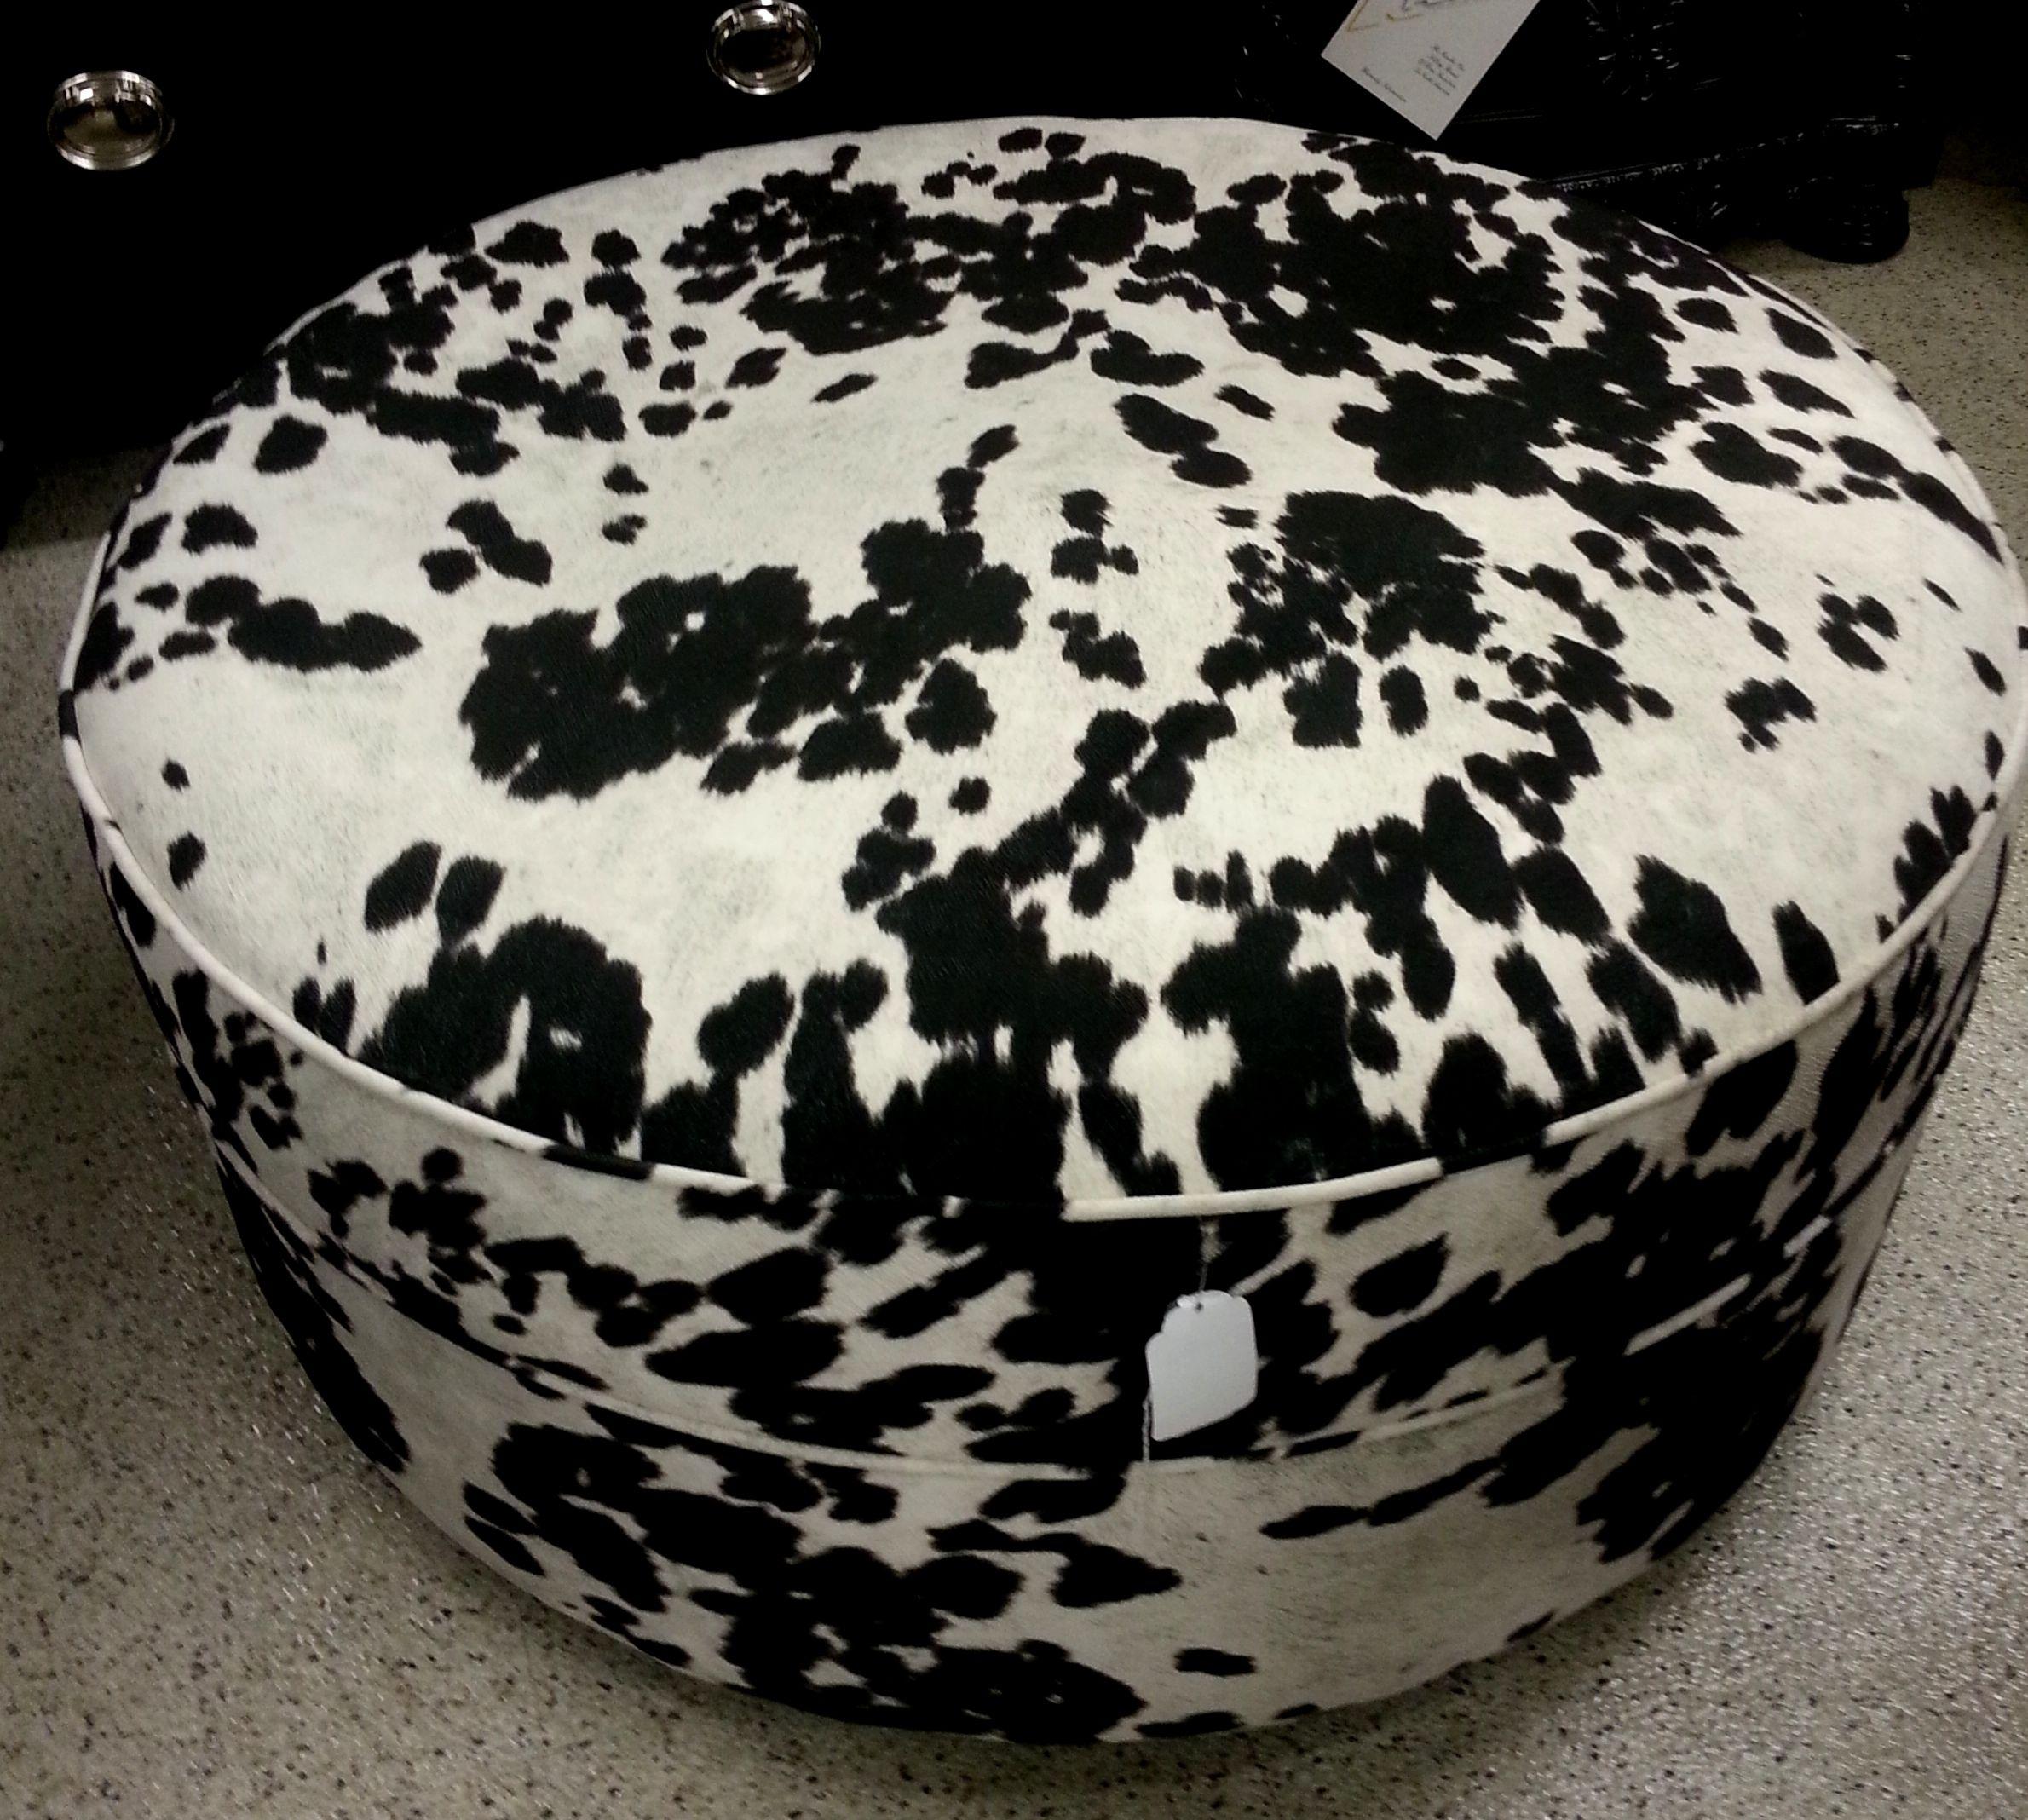 Cow Print Ottoman. Smartbuysforthehome.com Smart Buys Furniture RiverGate  Mall Nashville